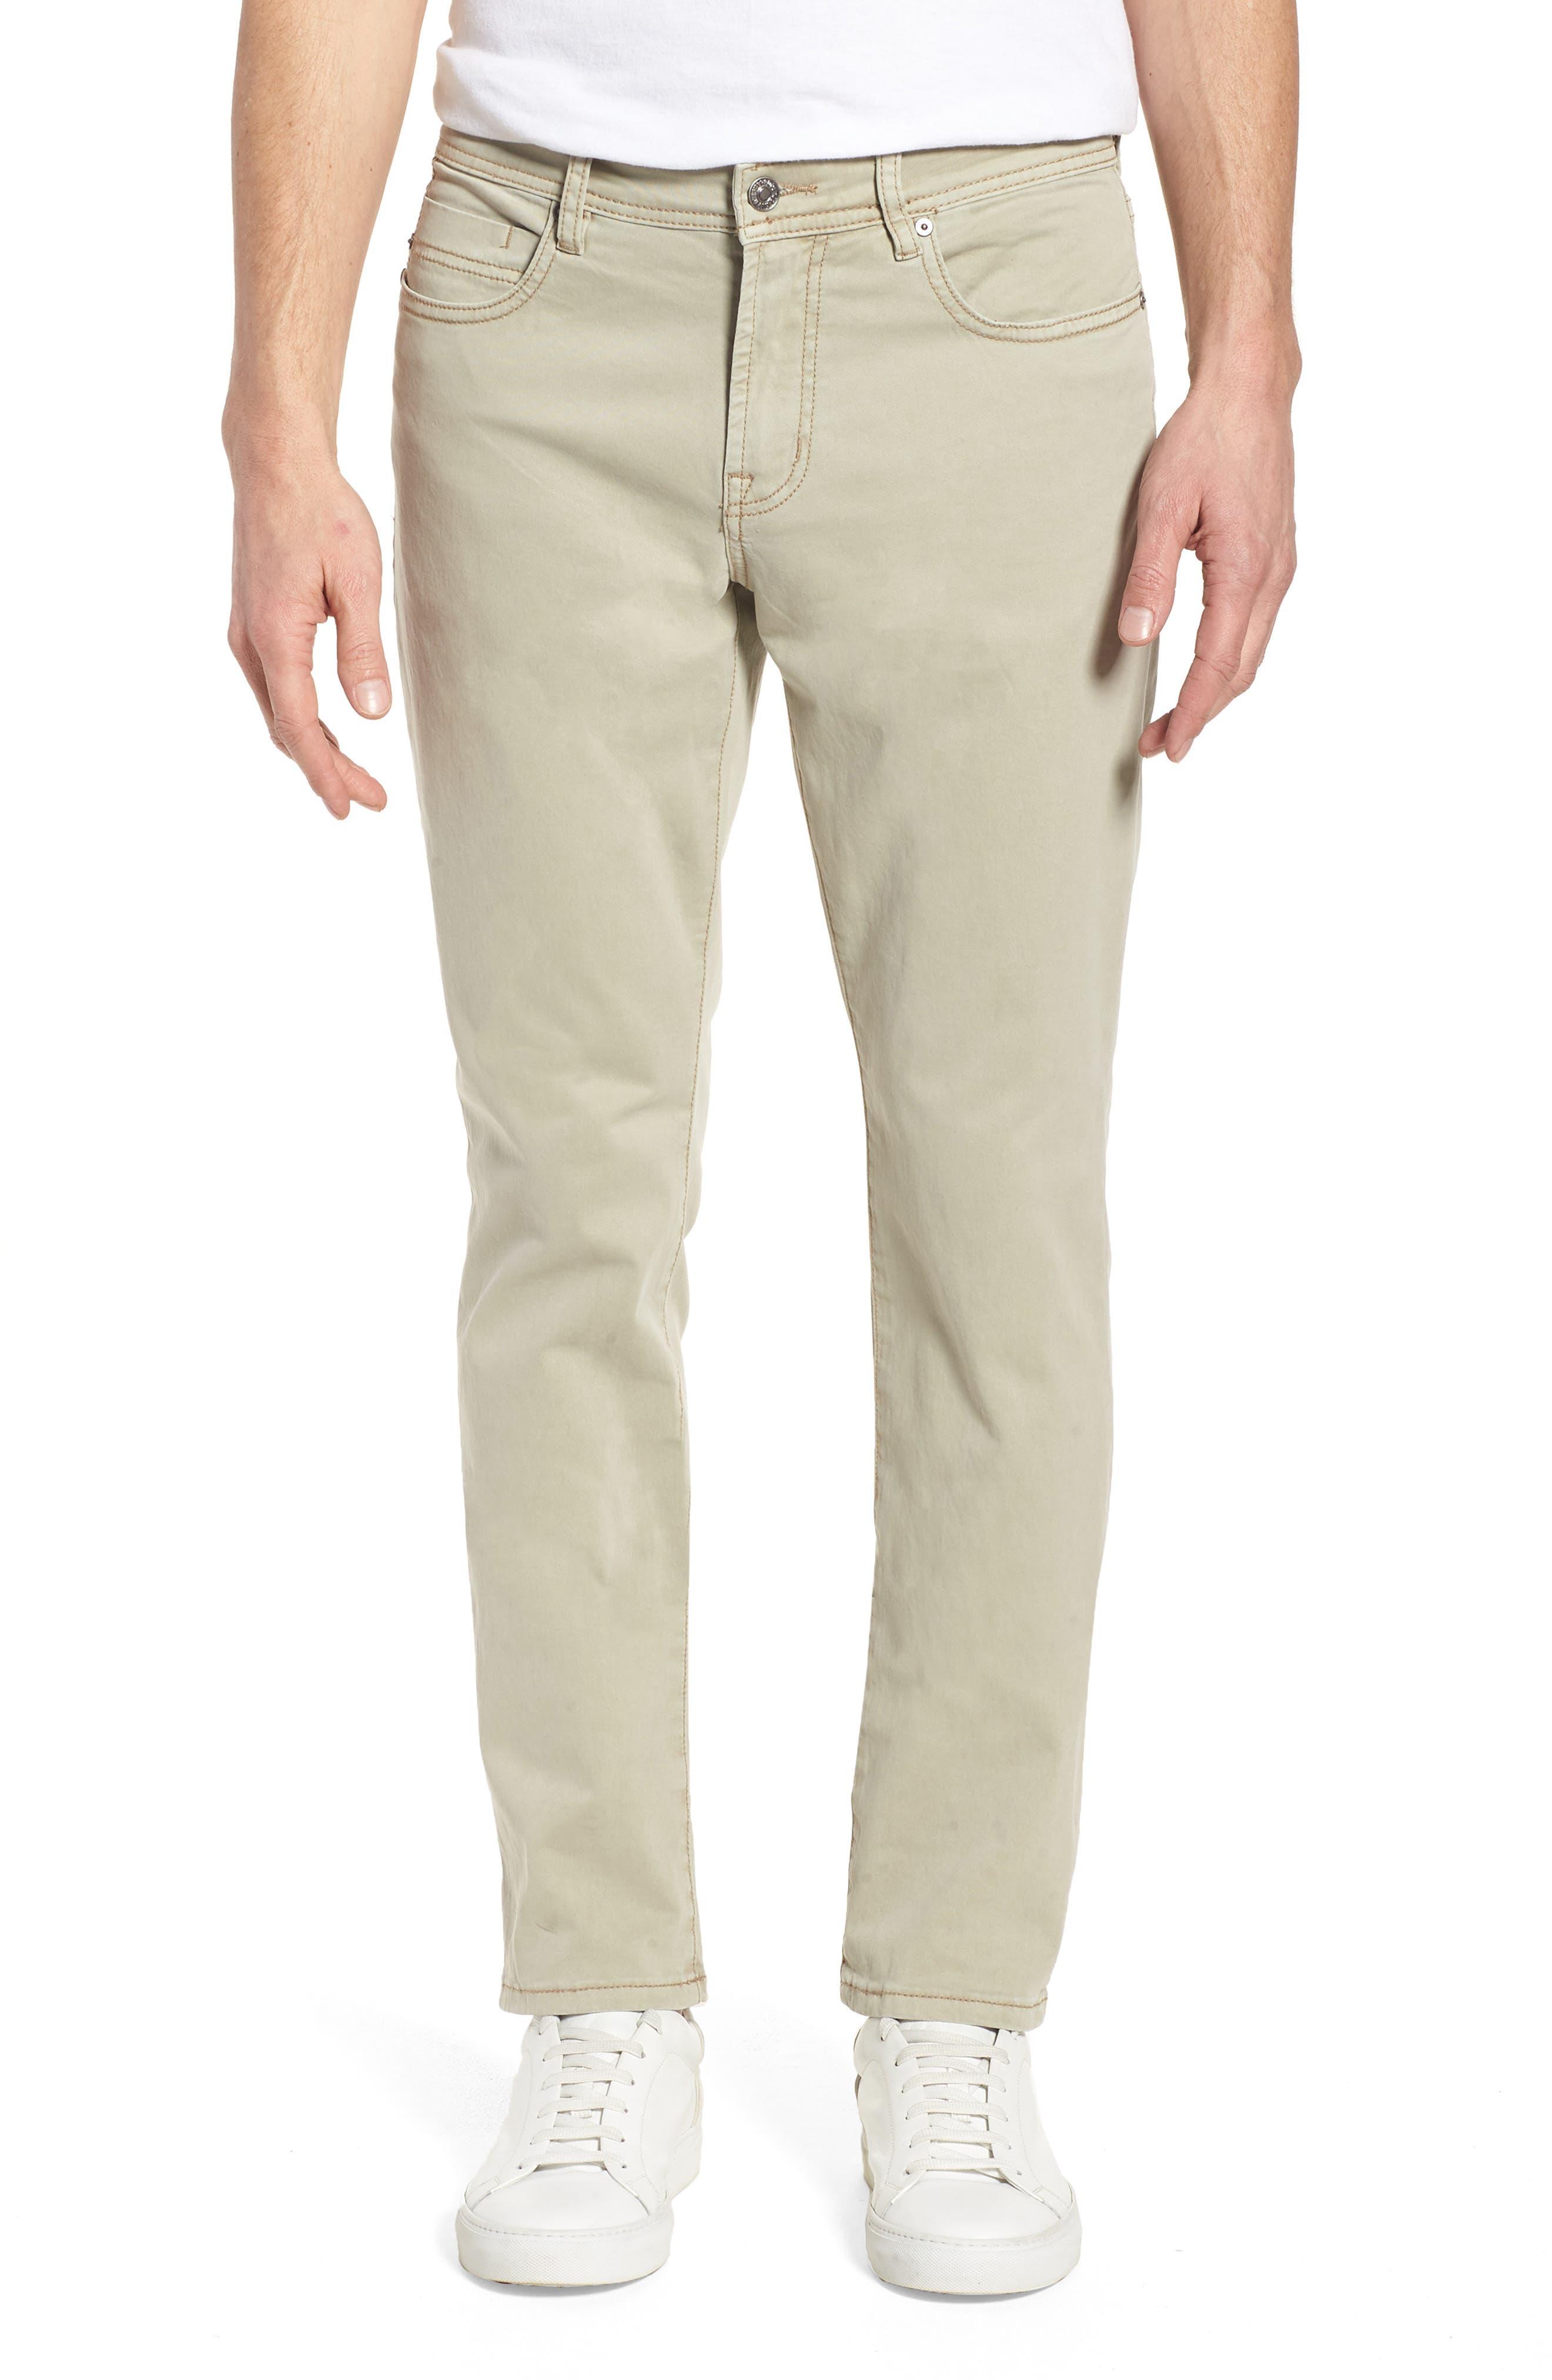 Jeans Co. Kingston Slim Straight Leg Jeans,                         Main,                         color, SANDSTROM